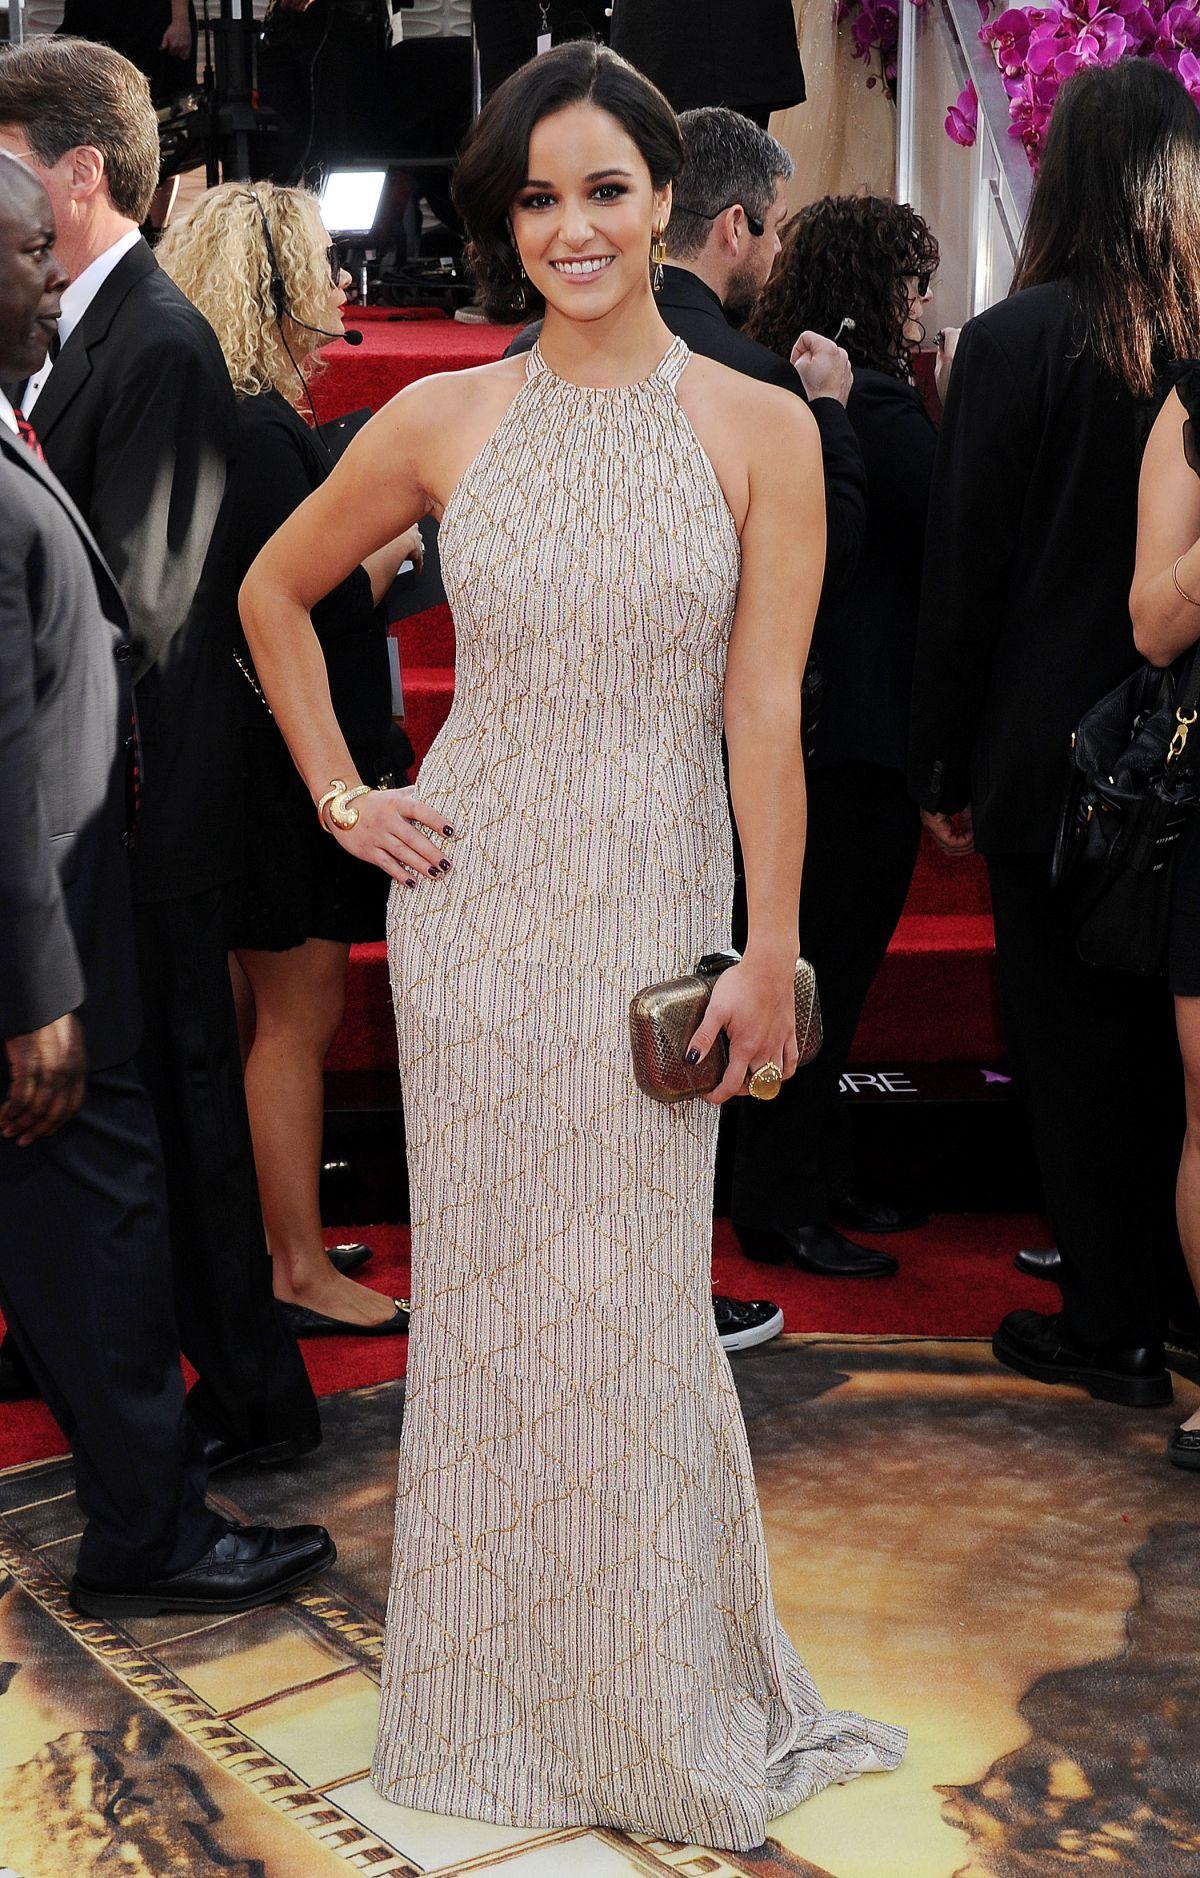 MELISSA FUMERO at 71st Annual Golden Globe Awards